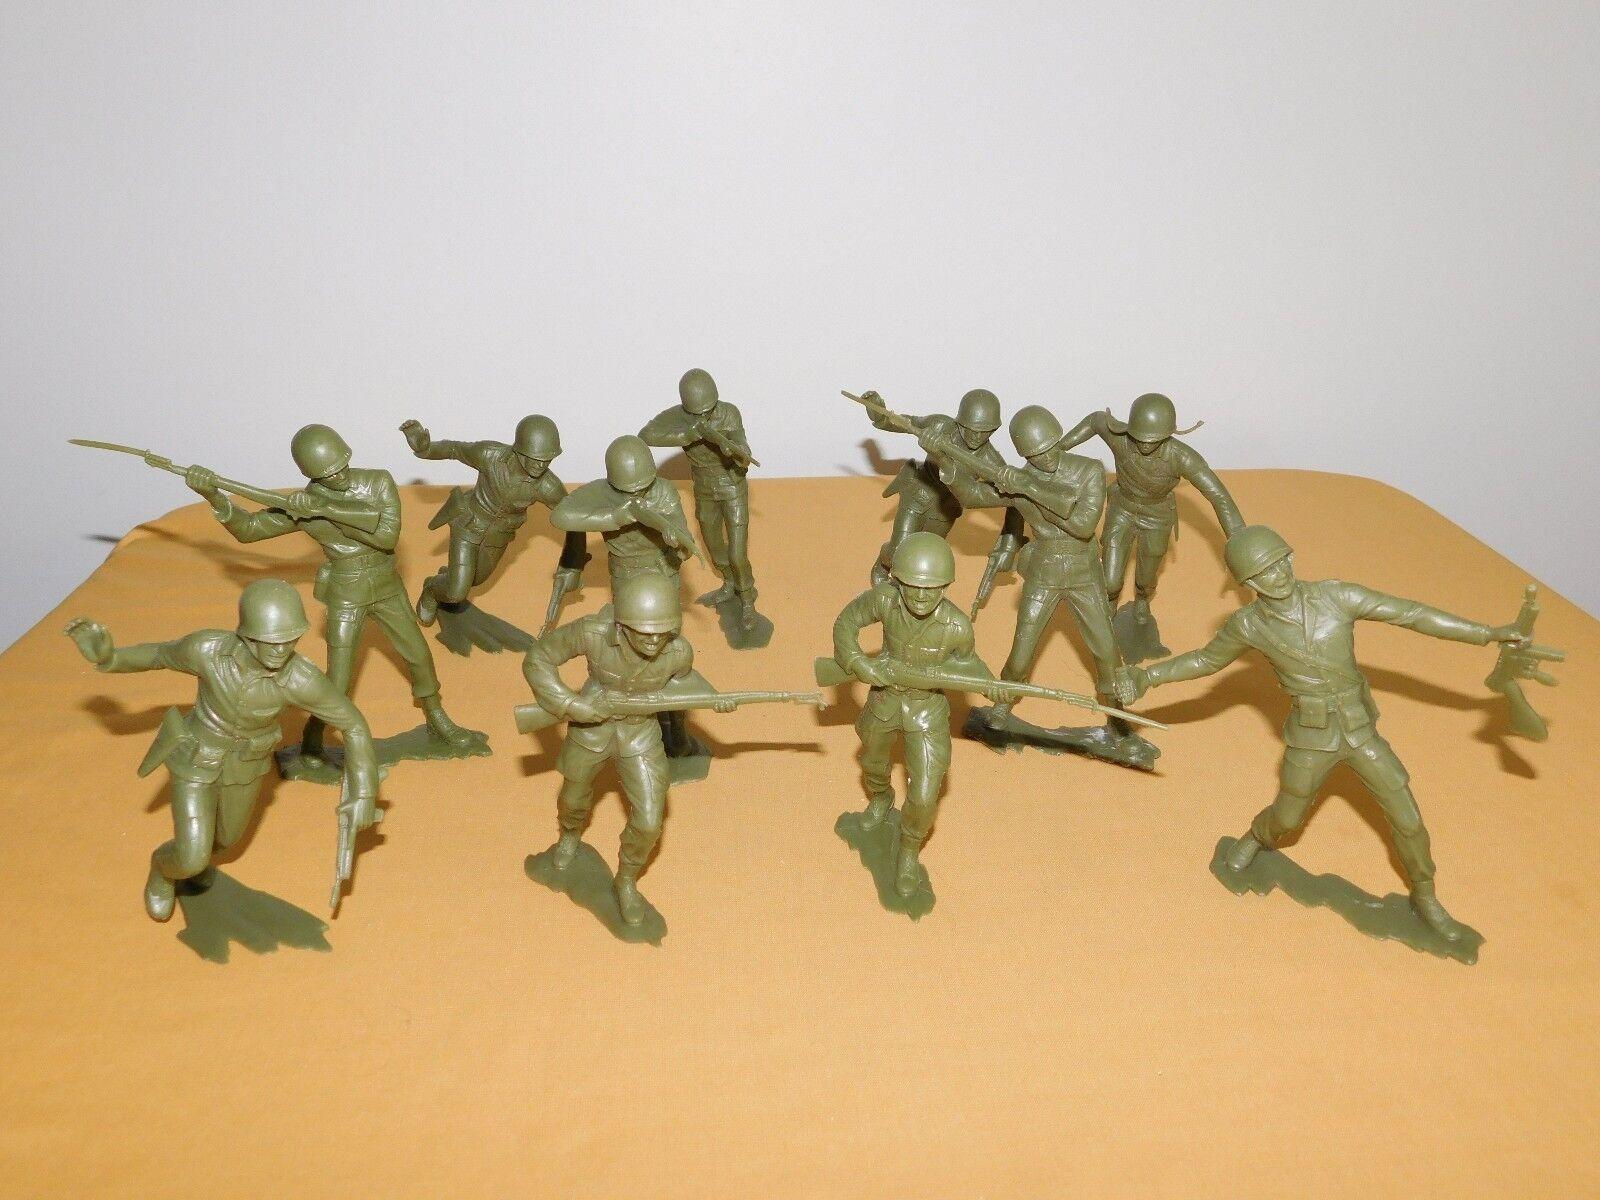 VINTAGE OLD TOY 10 WWII 5 1 2  HIGH PLASTIC USMC US MARINES SOLDIERS LOT